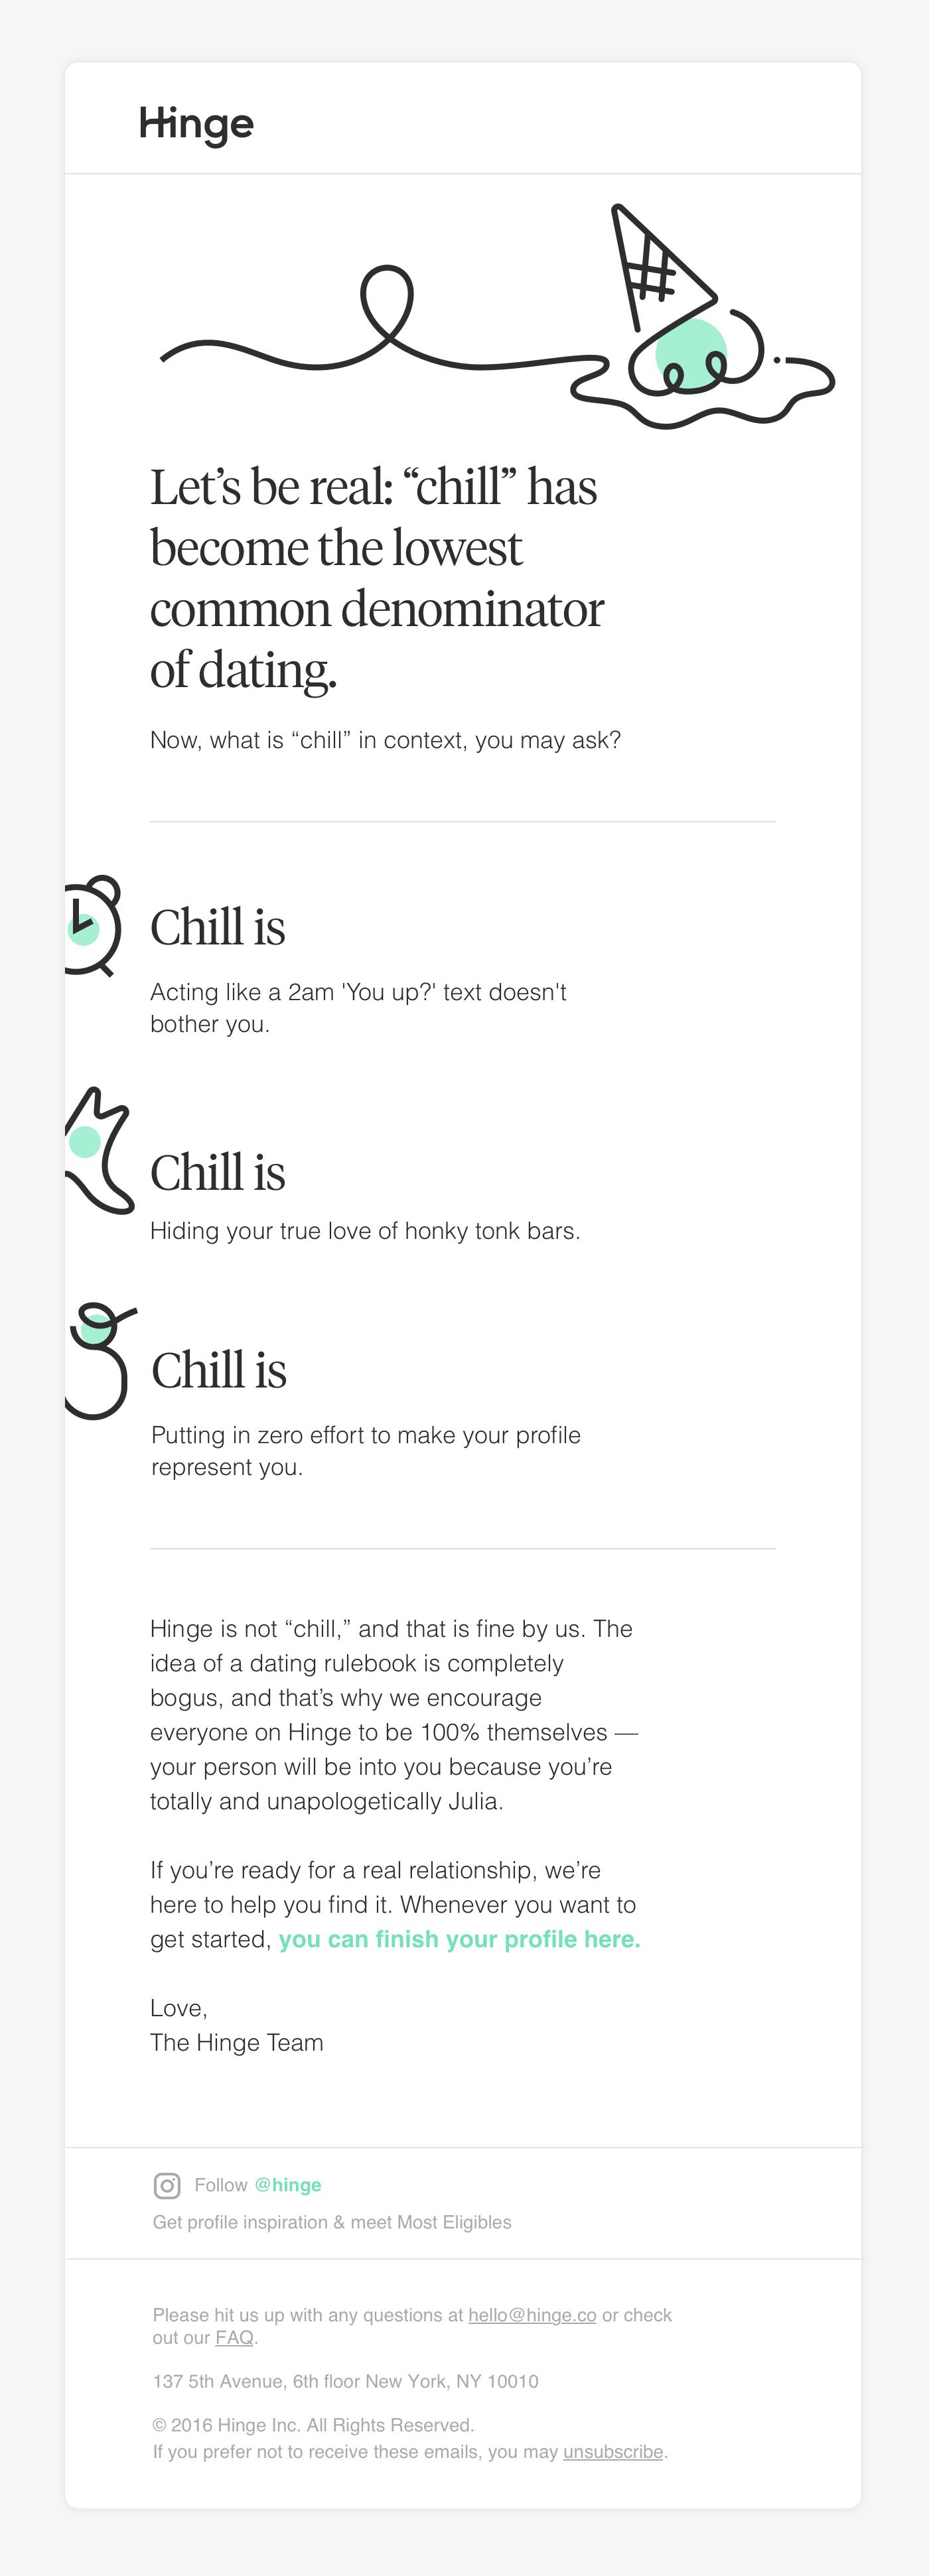 Vapaa maailma dating chat